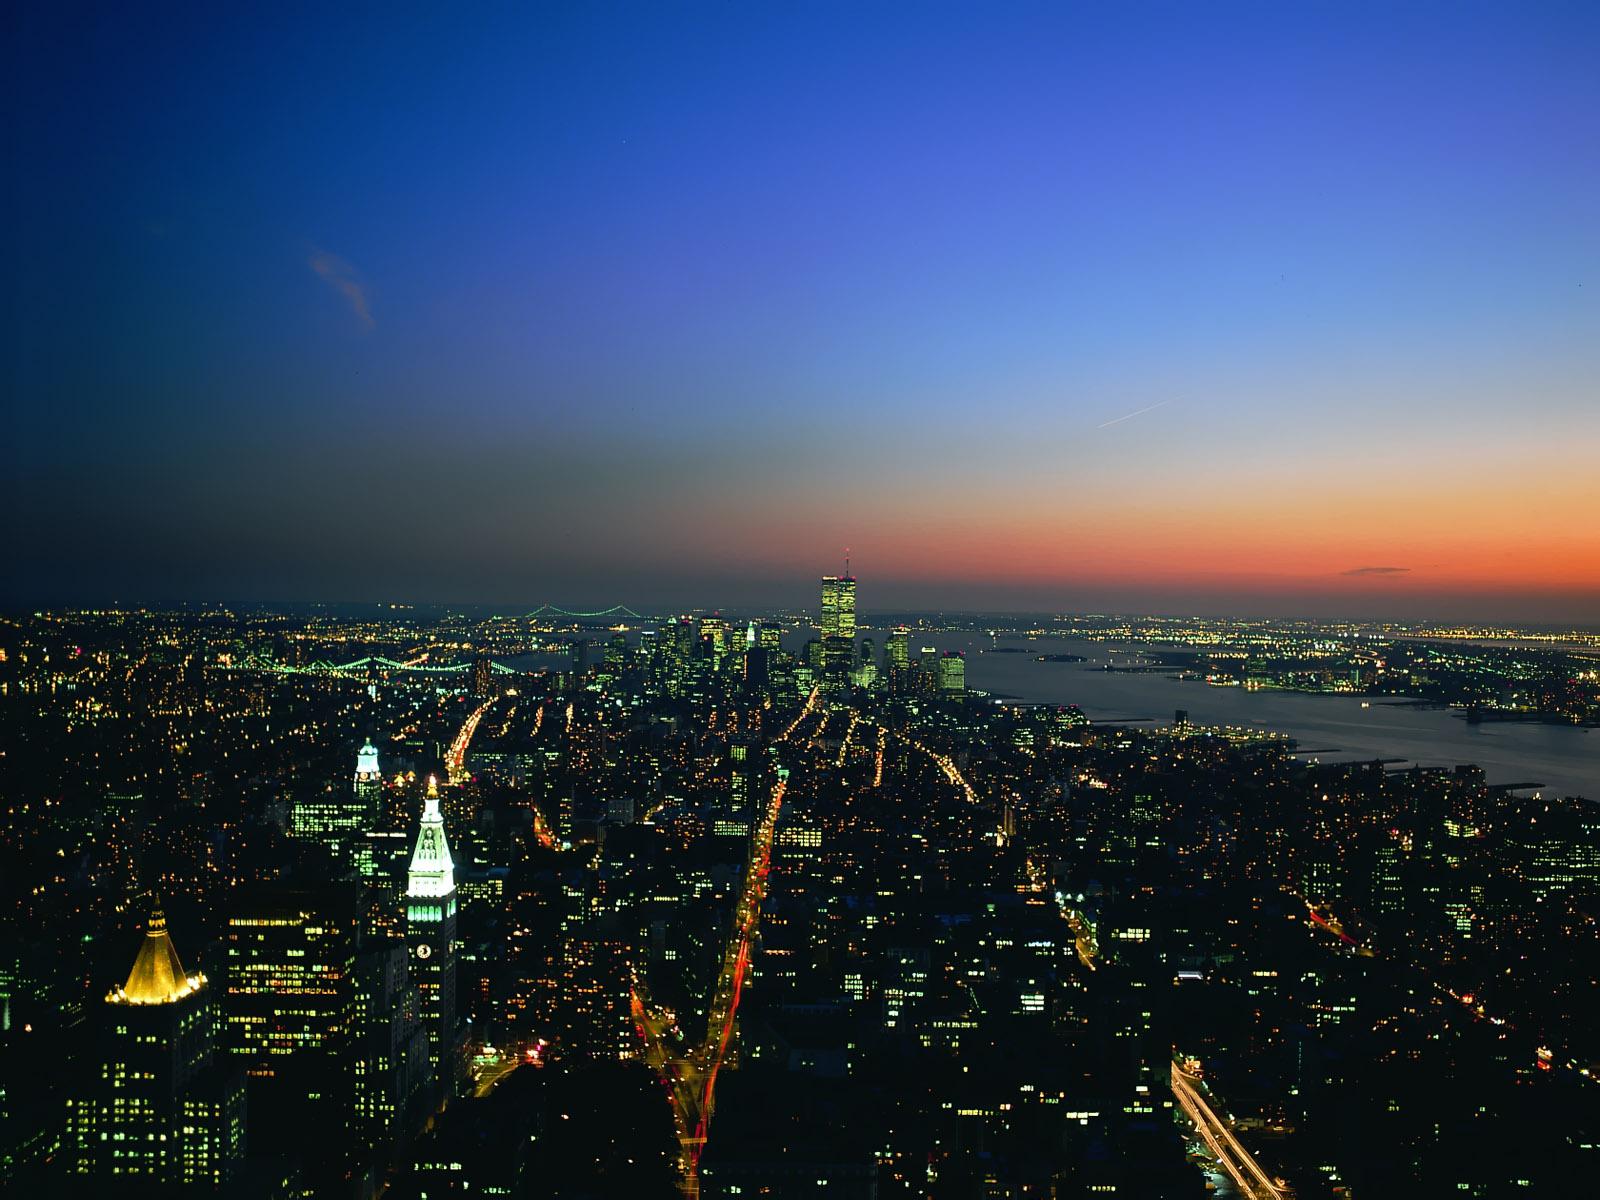 Night City Lights Wallpaper Hd Night city lights   hd 1600x1200